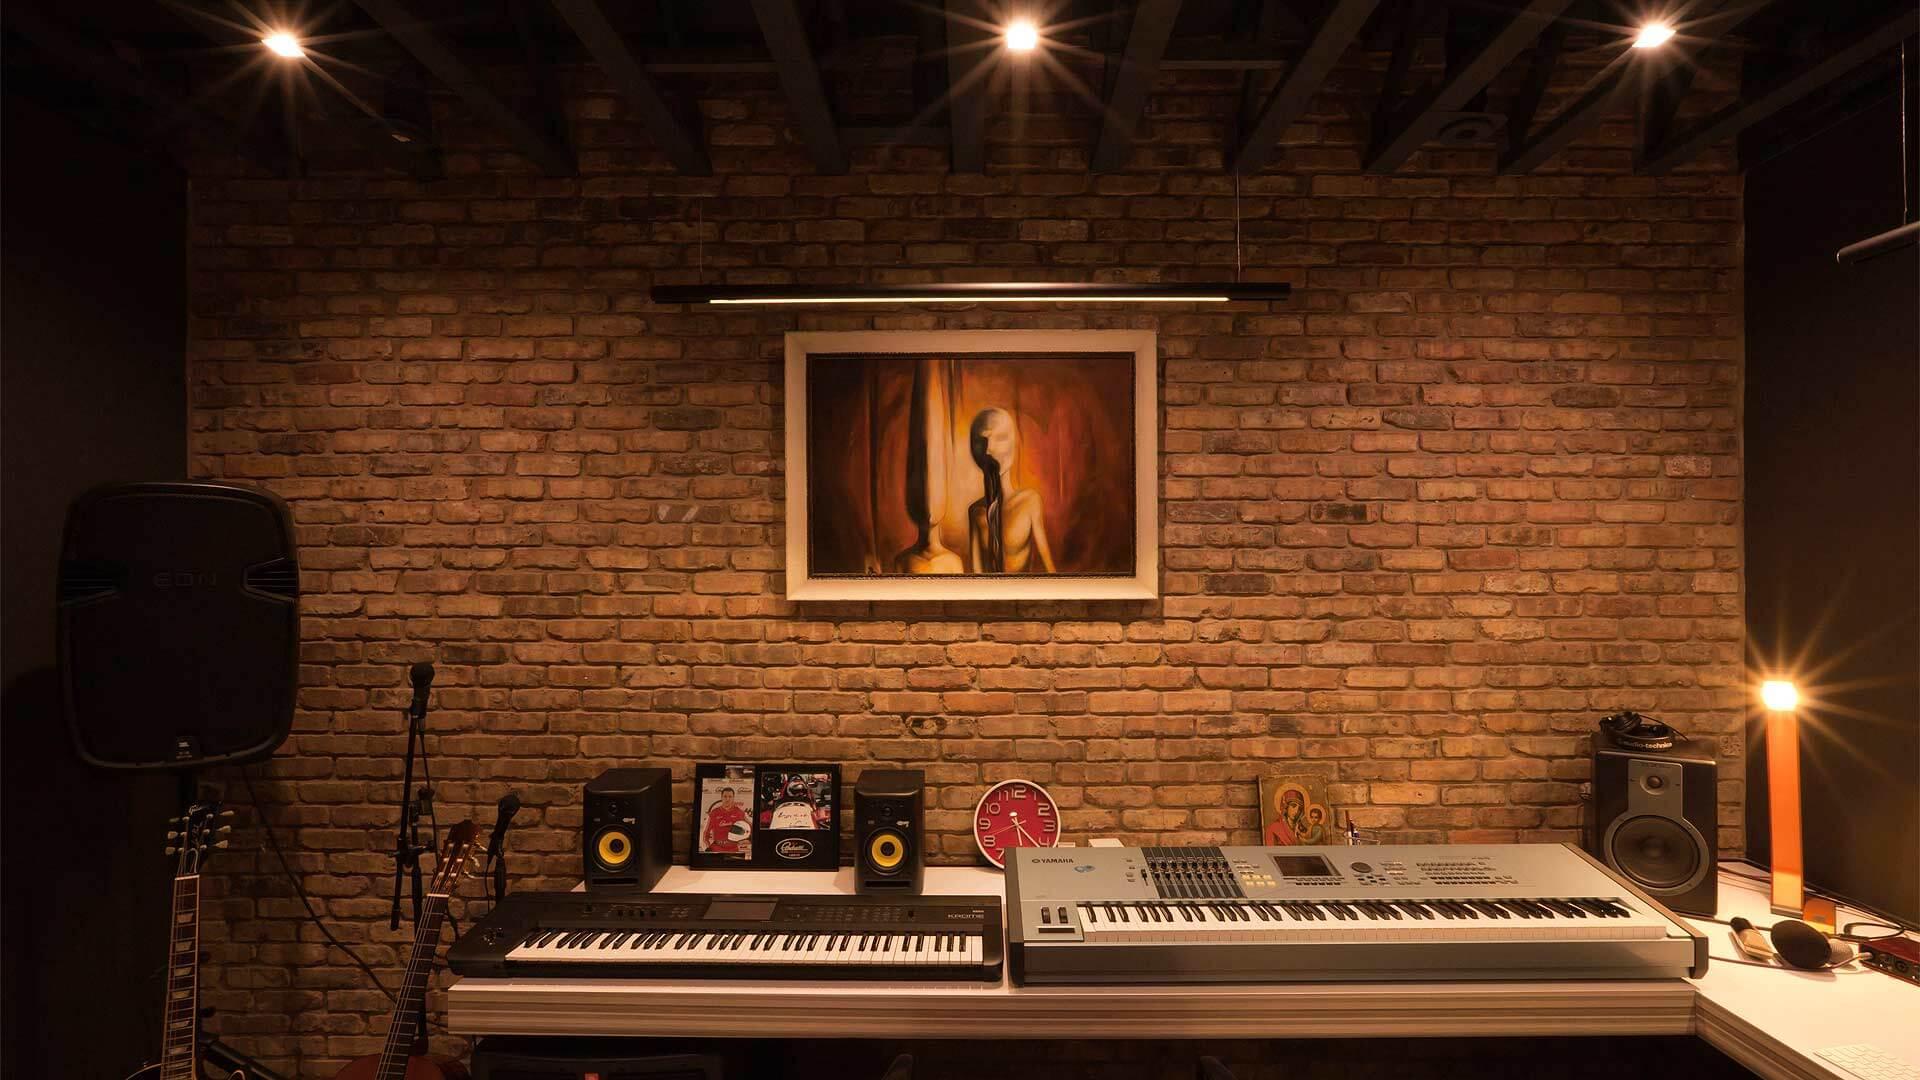 Downstairs Sound Studio - Minimalist Modern - Indian Head Park - Chicago, Illinois - HAUS   Architecture For Modern Lifestyles, Christopher Short, Indianapolis Architect with Joe Trojanowski